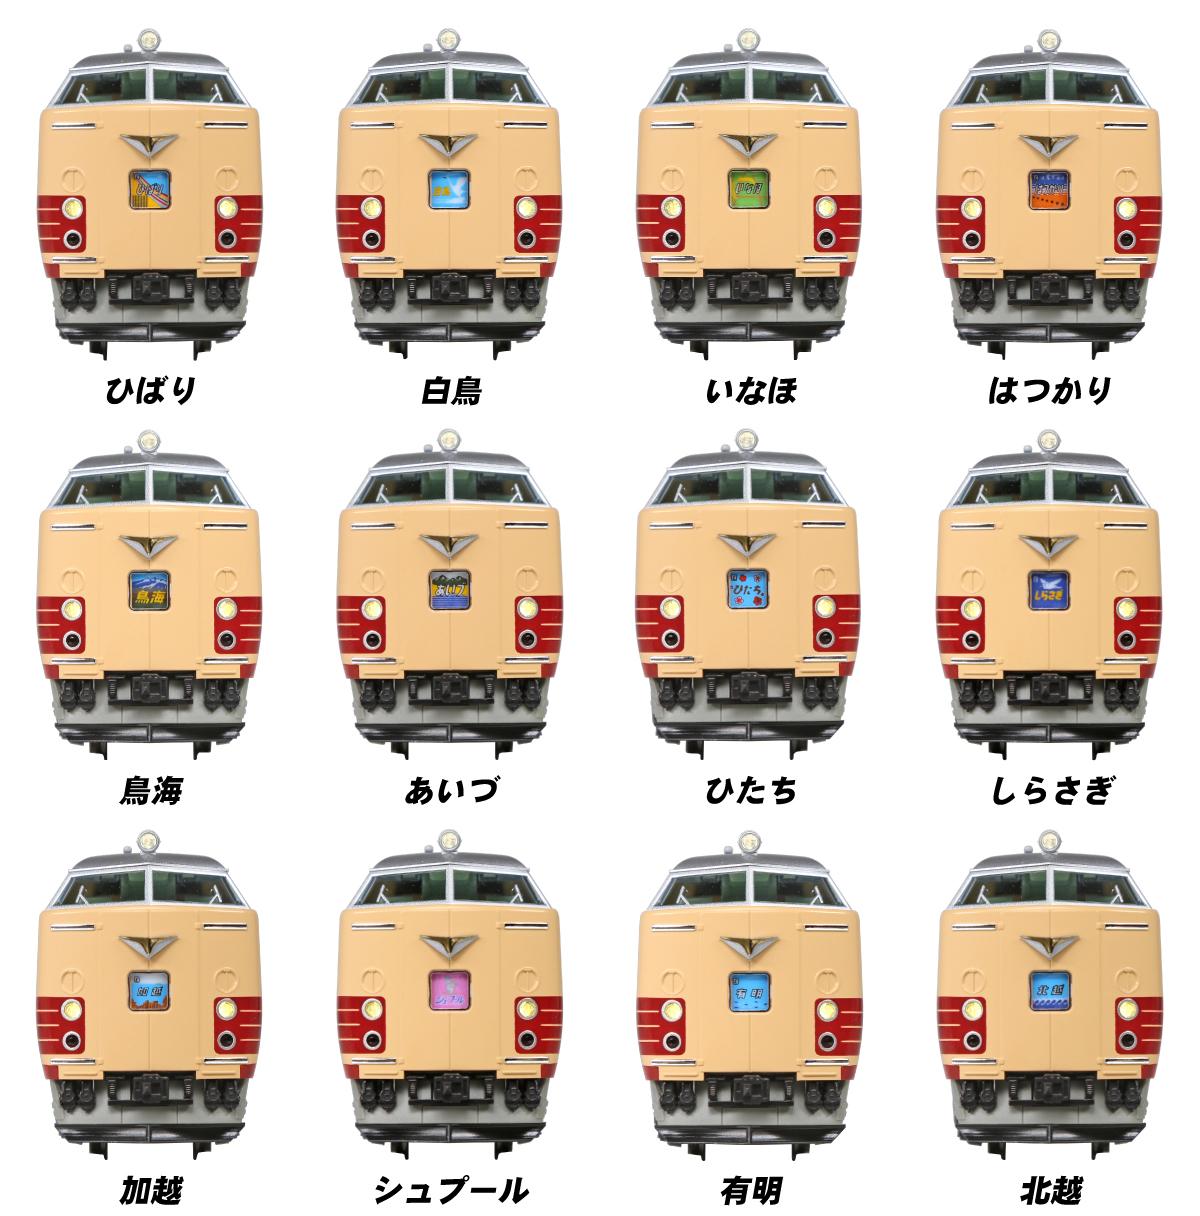 KATO カトー 11-328 トレインマーク変換装置 485系200番台用(国鉄・イラスト)